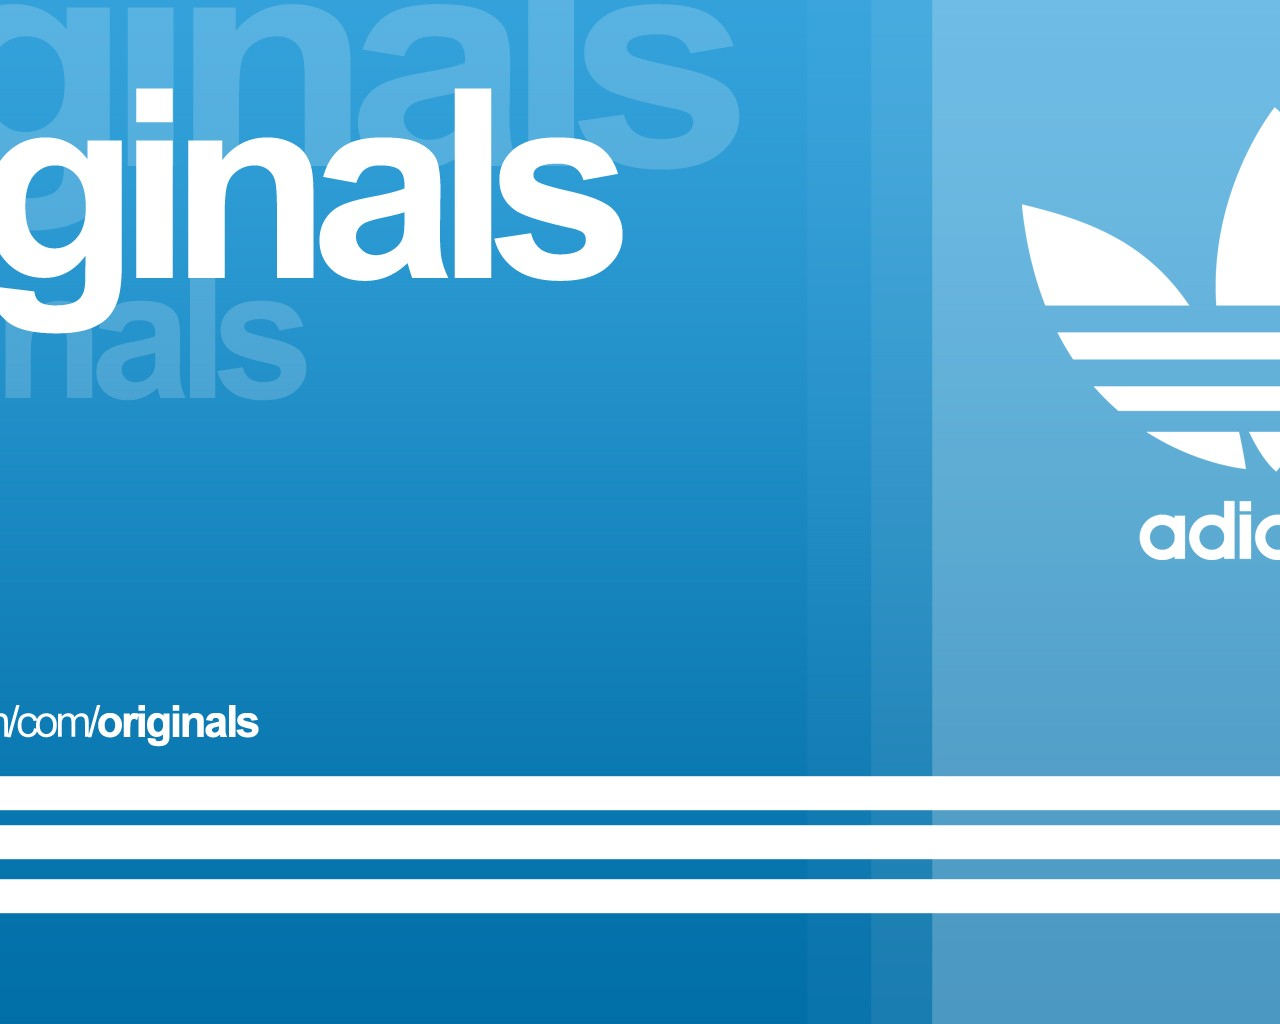 Free Download Pics Photos Adidas Original Wallpaper